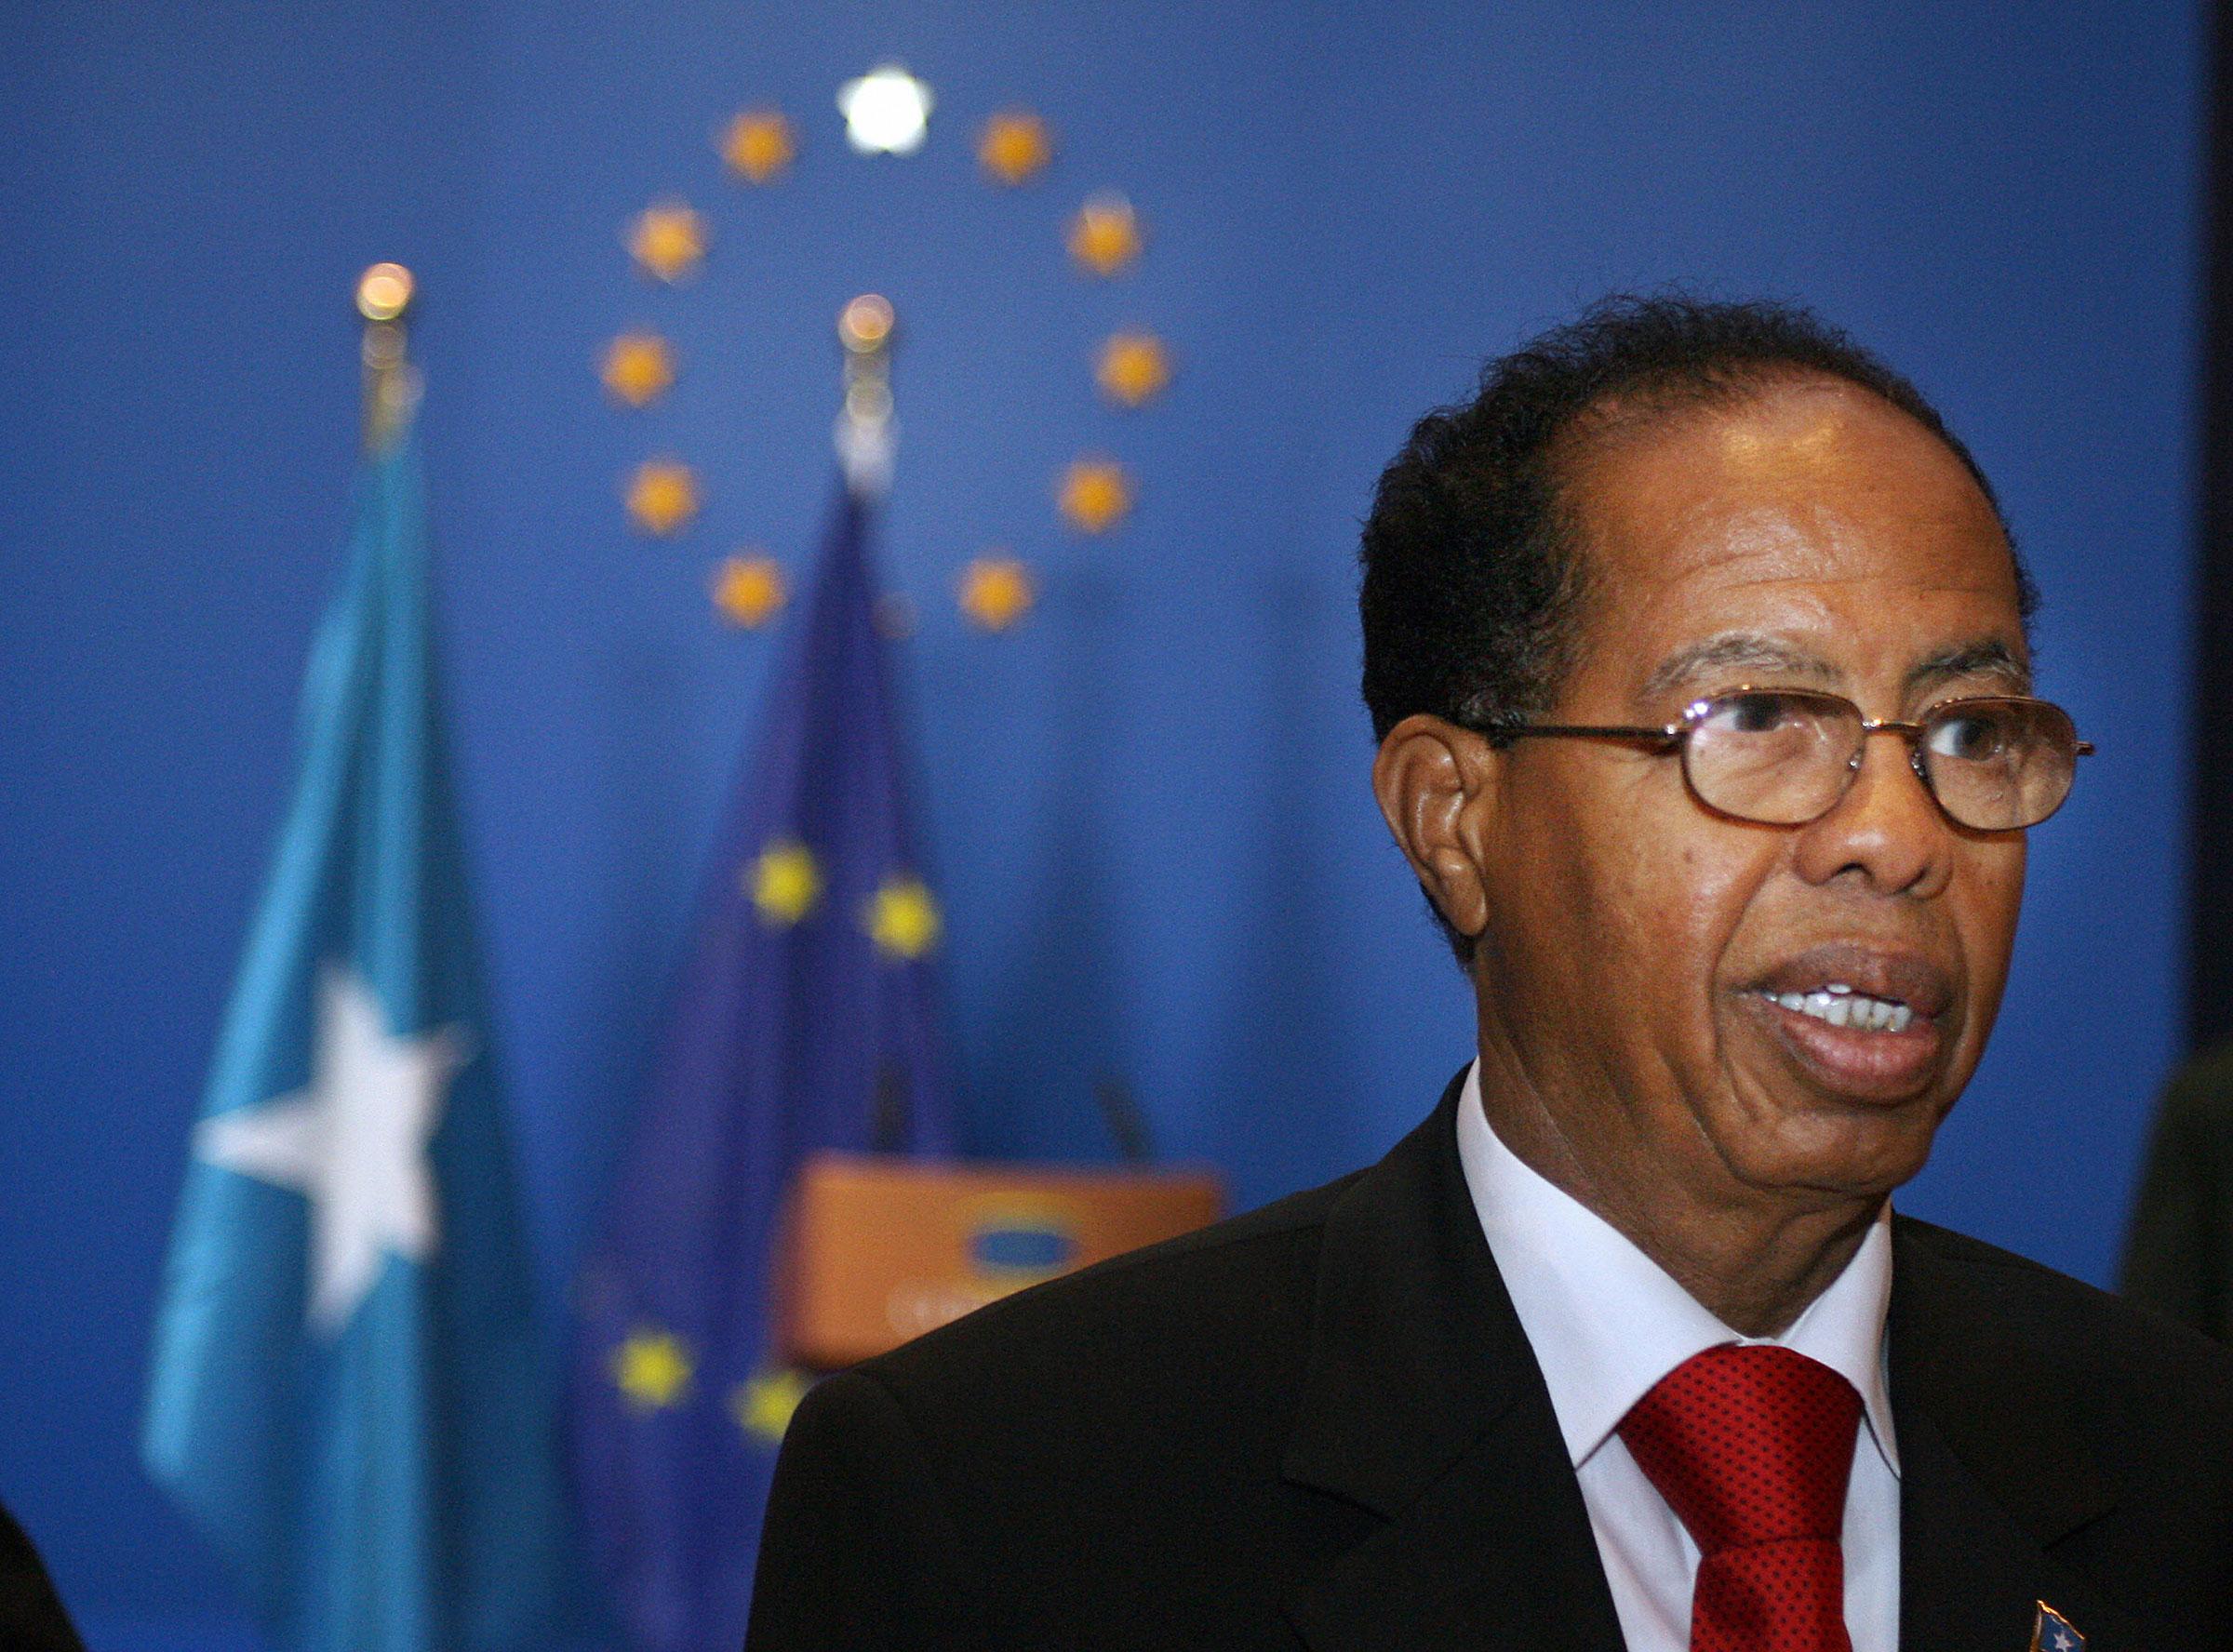 Somalian Prime Minister Nur Hassan Hussein in February 2008